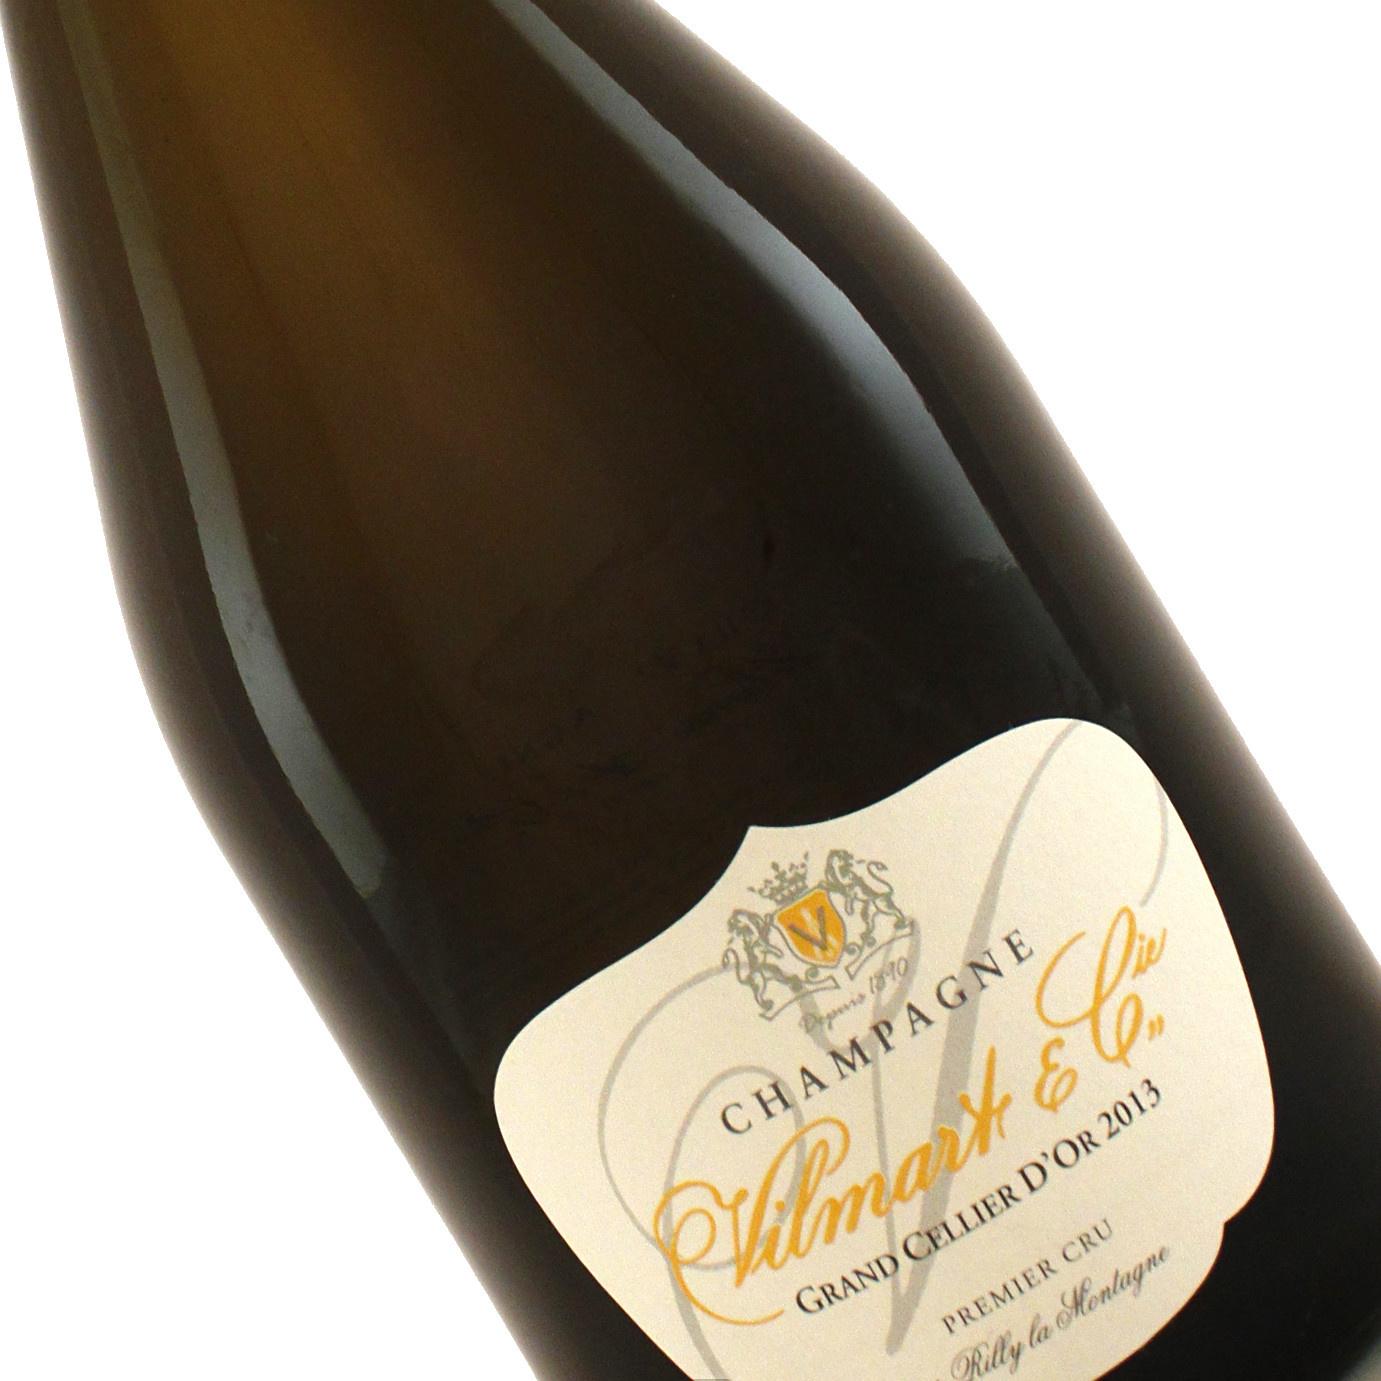 "Vilmart & Cie 2013 Champagne ""Grand Cellier D'Or Premier Cru"